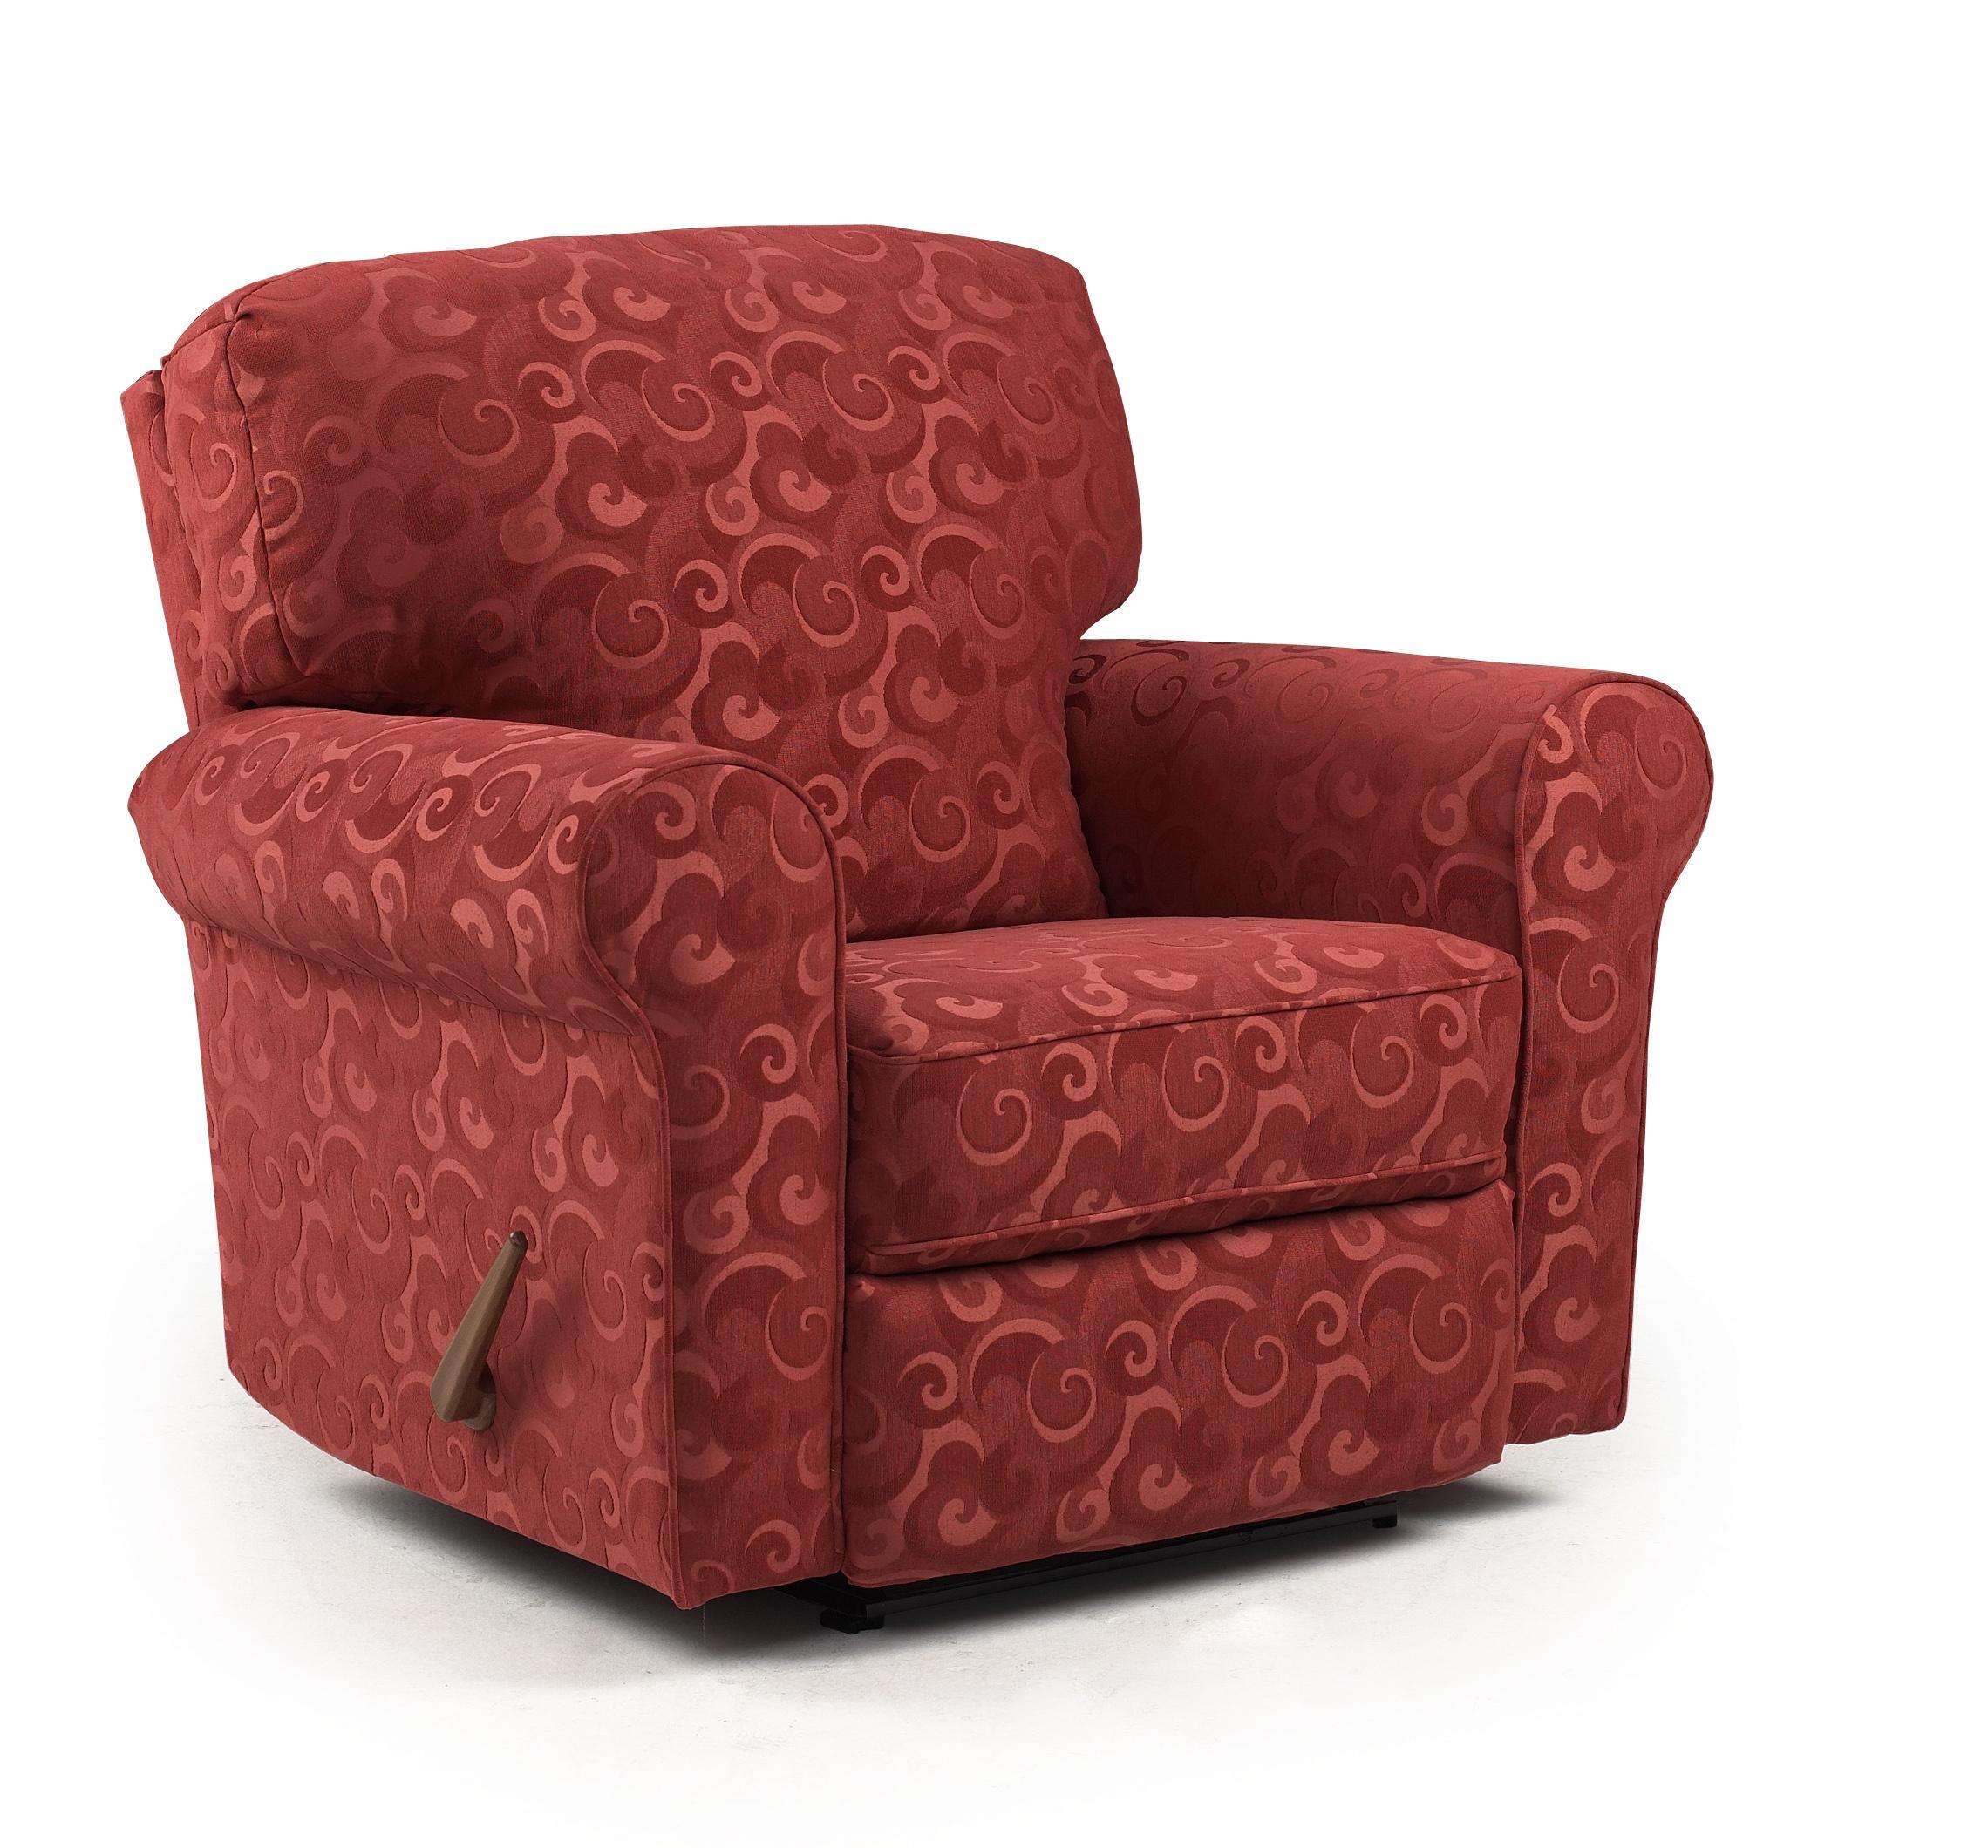 best chairs swivel glider recliner office chair set home furnishings recliners medium irvington